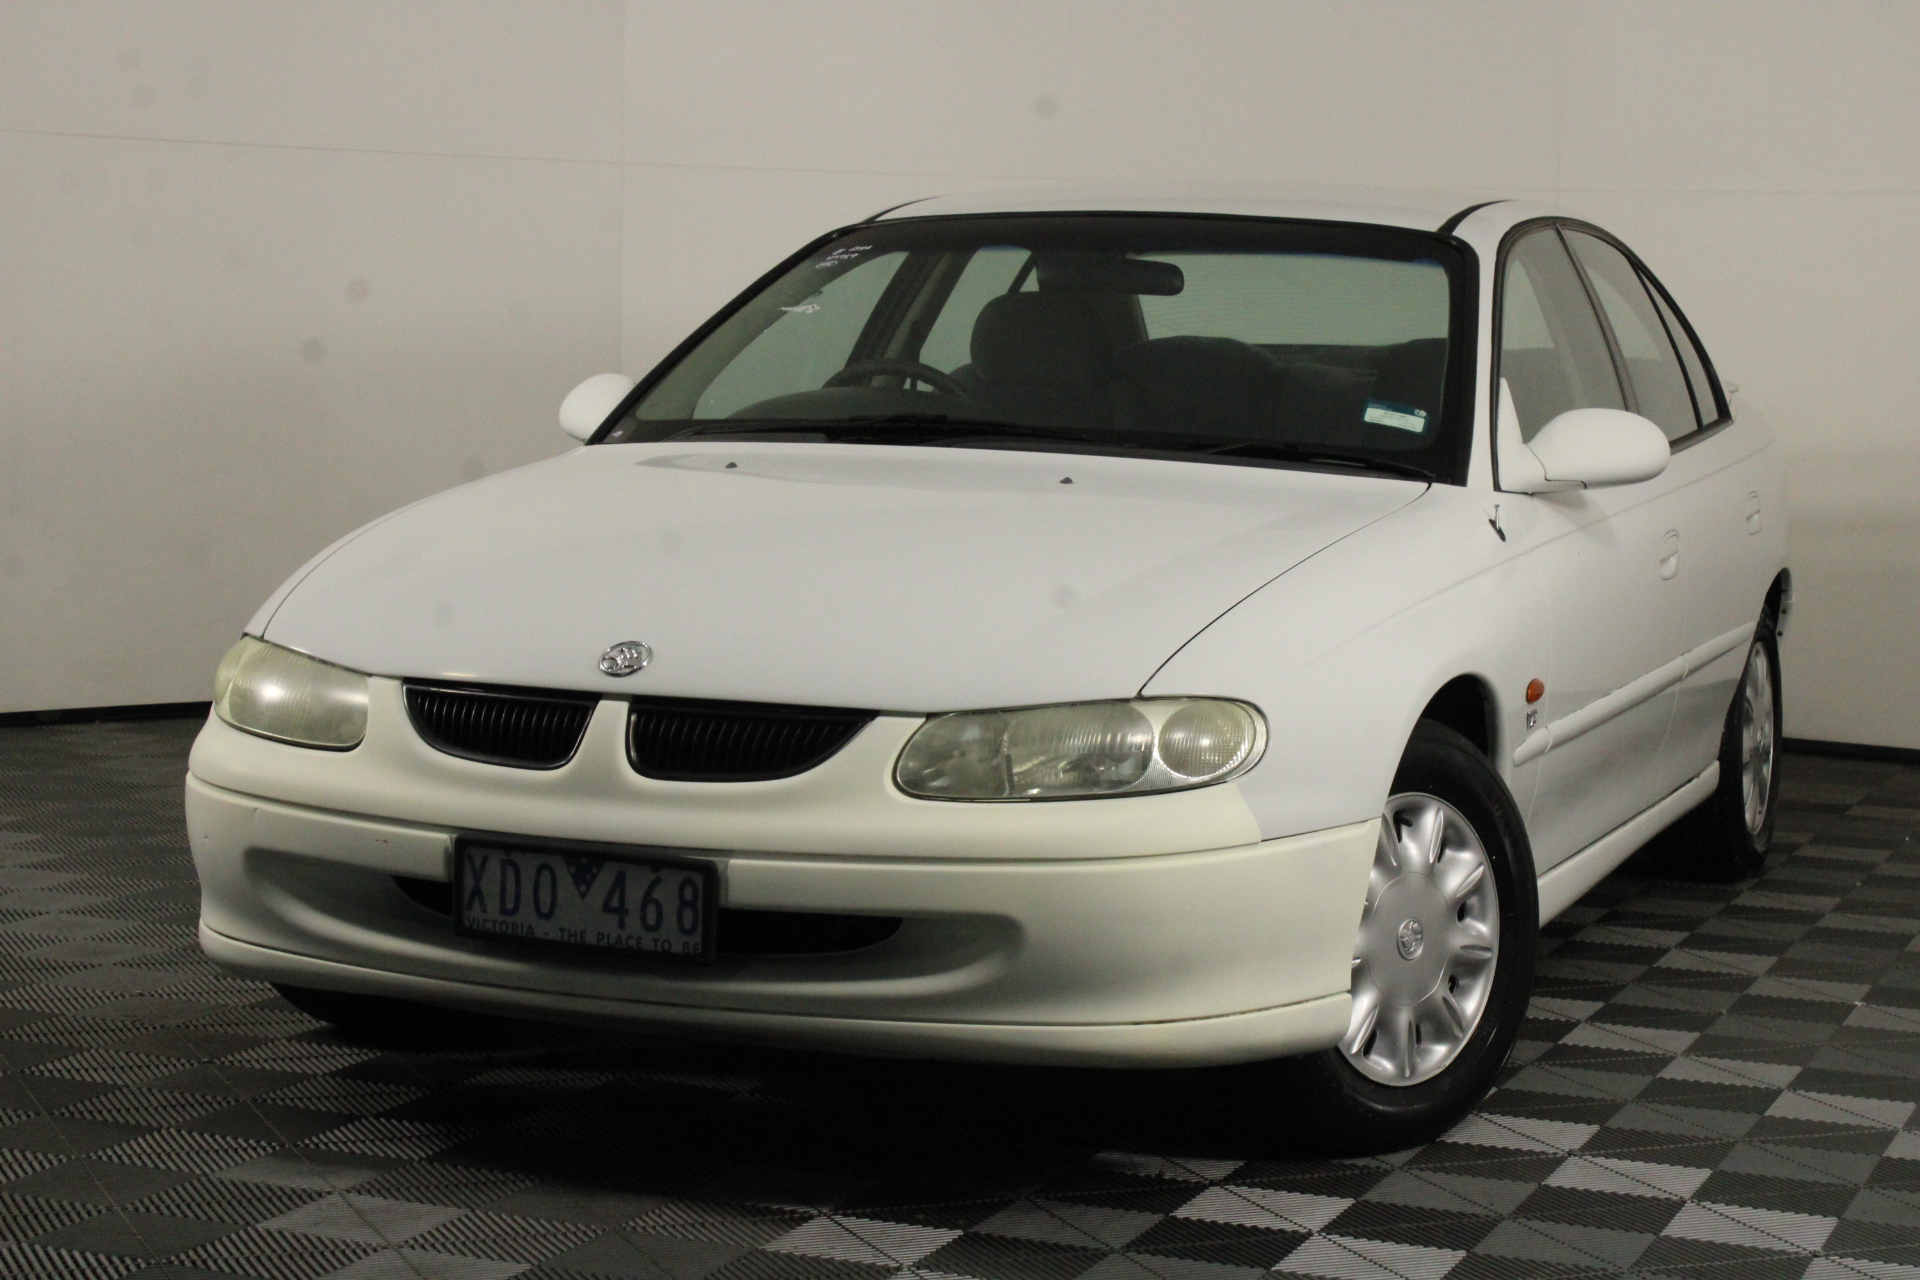 1998 Holden Commodore Executive VT Automatic Sedan